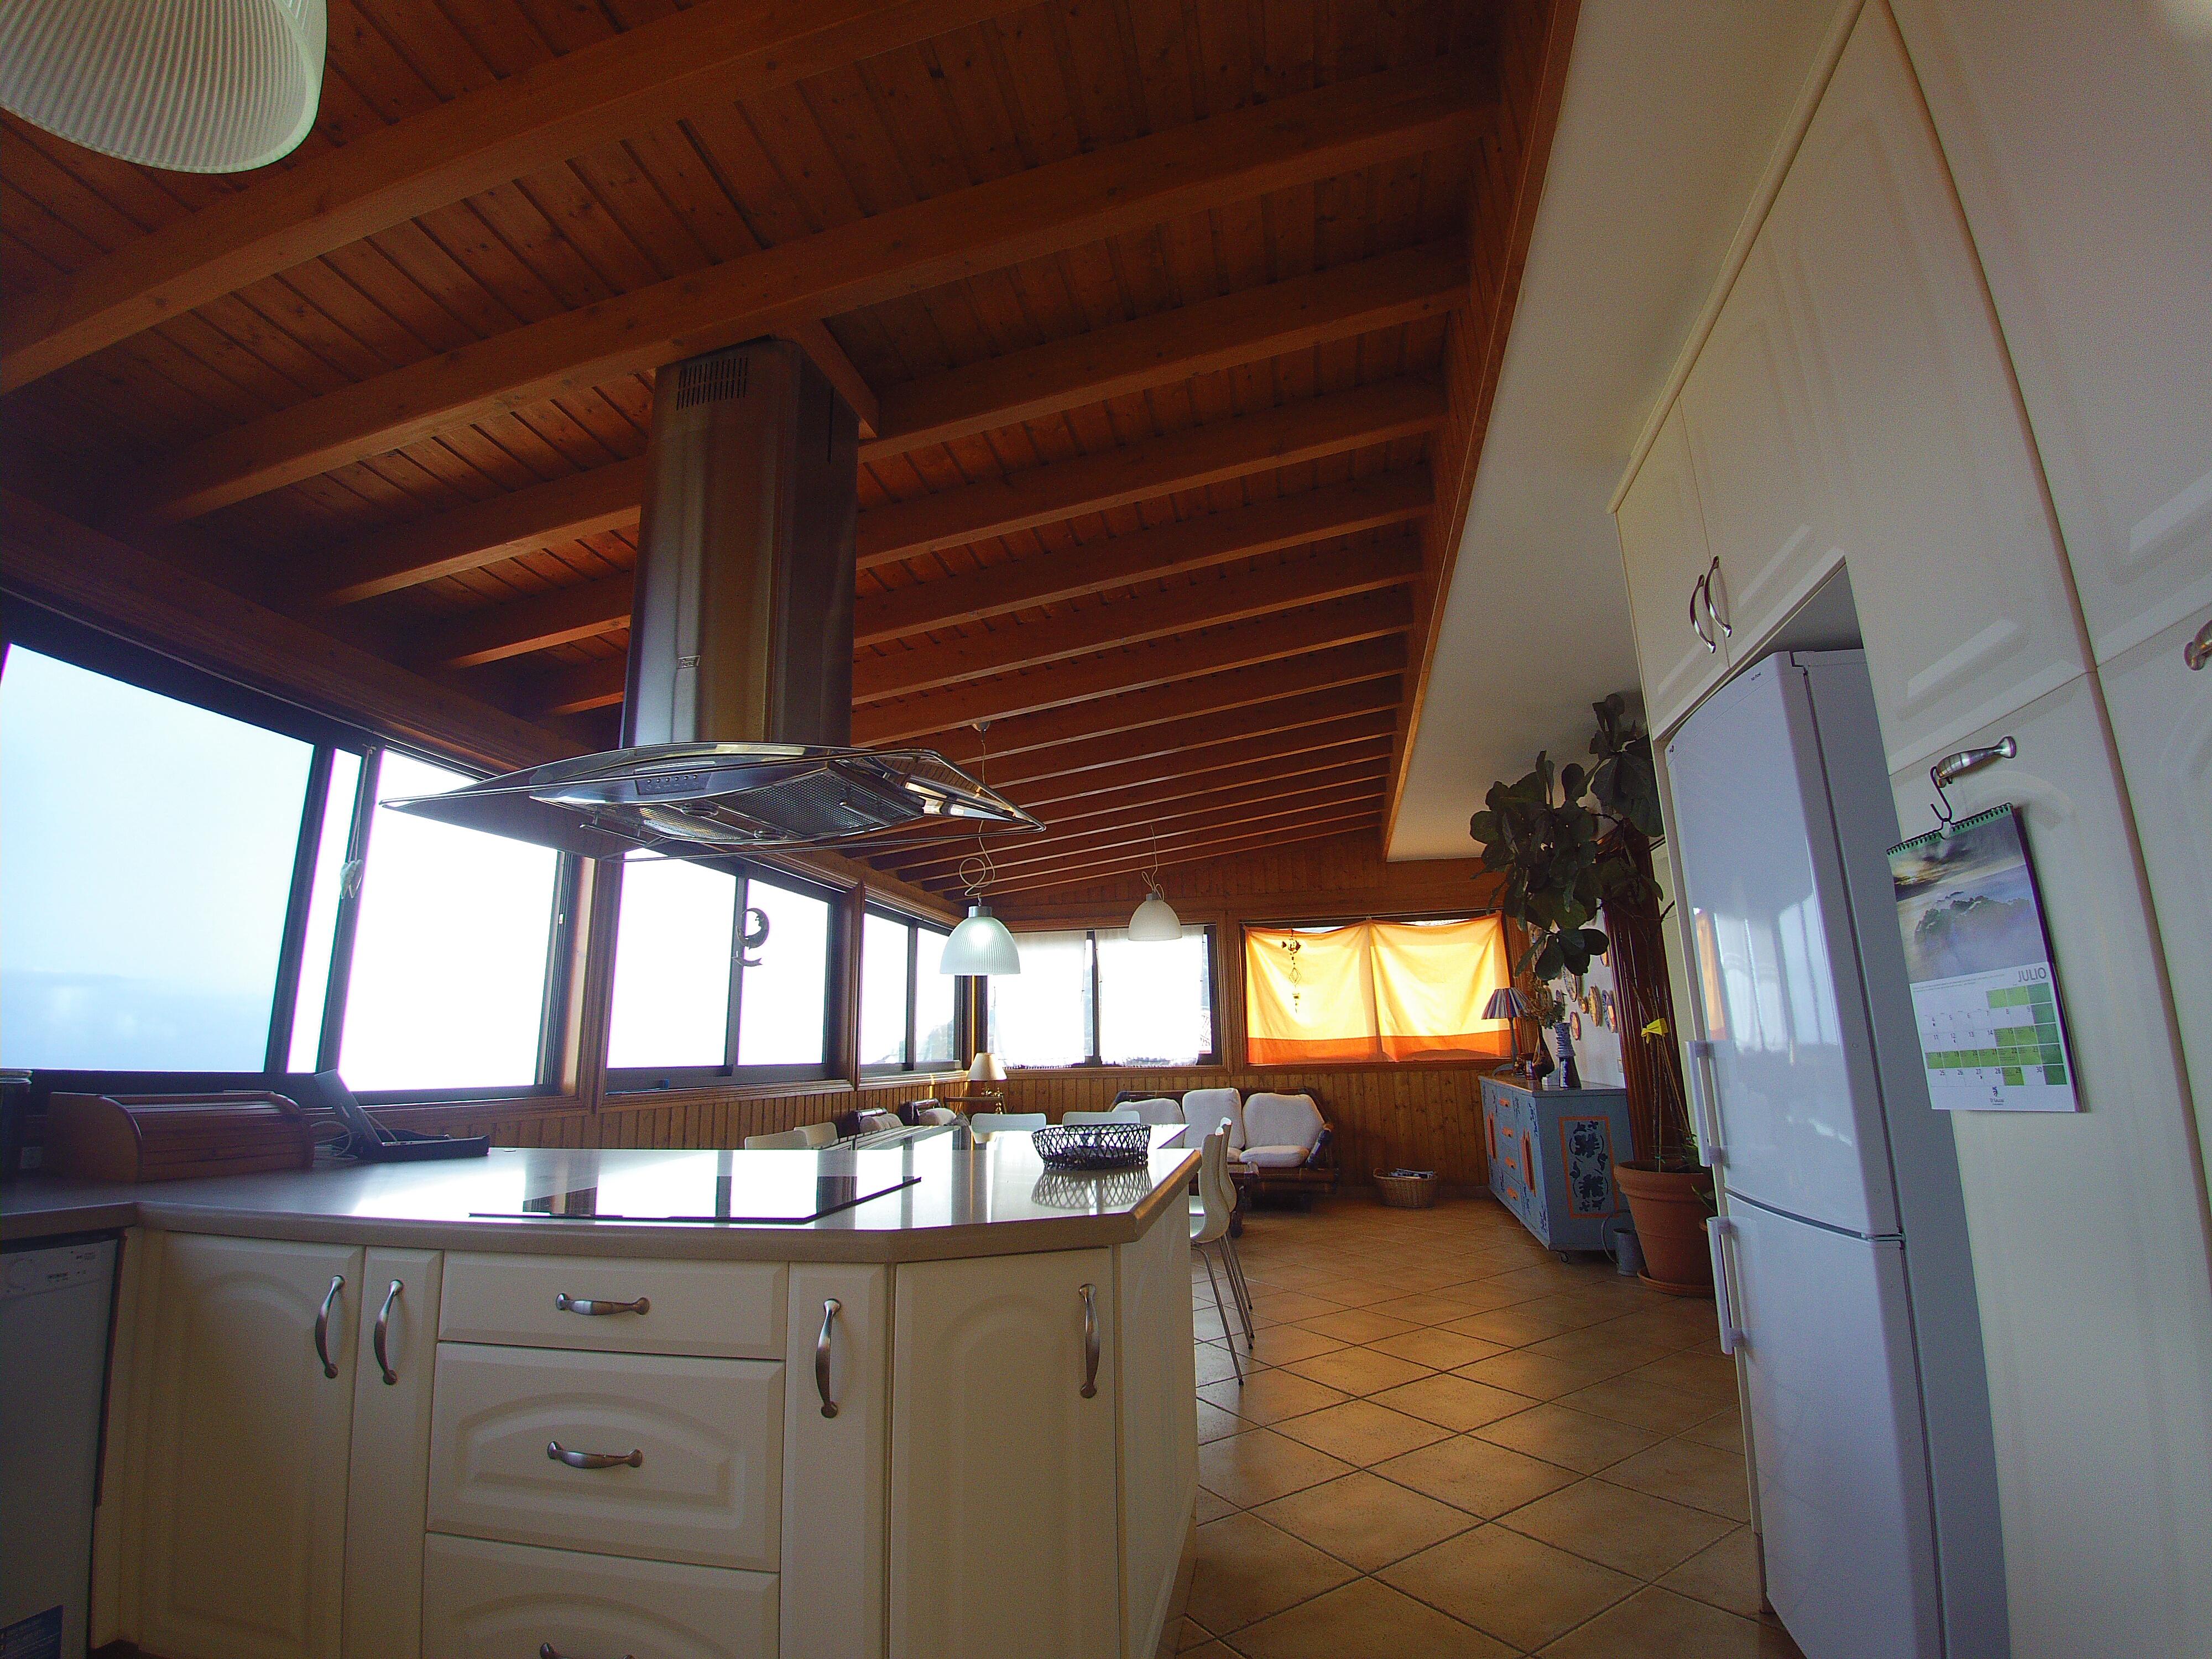 Maison de vacances Villa Primavera beheizbarer Pool kostenloses Wifi Grill (2125225), El Sauzal, Ténérife, Iles Canaries, Espagne, image 7